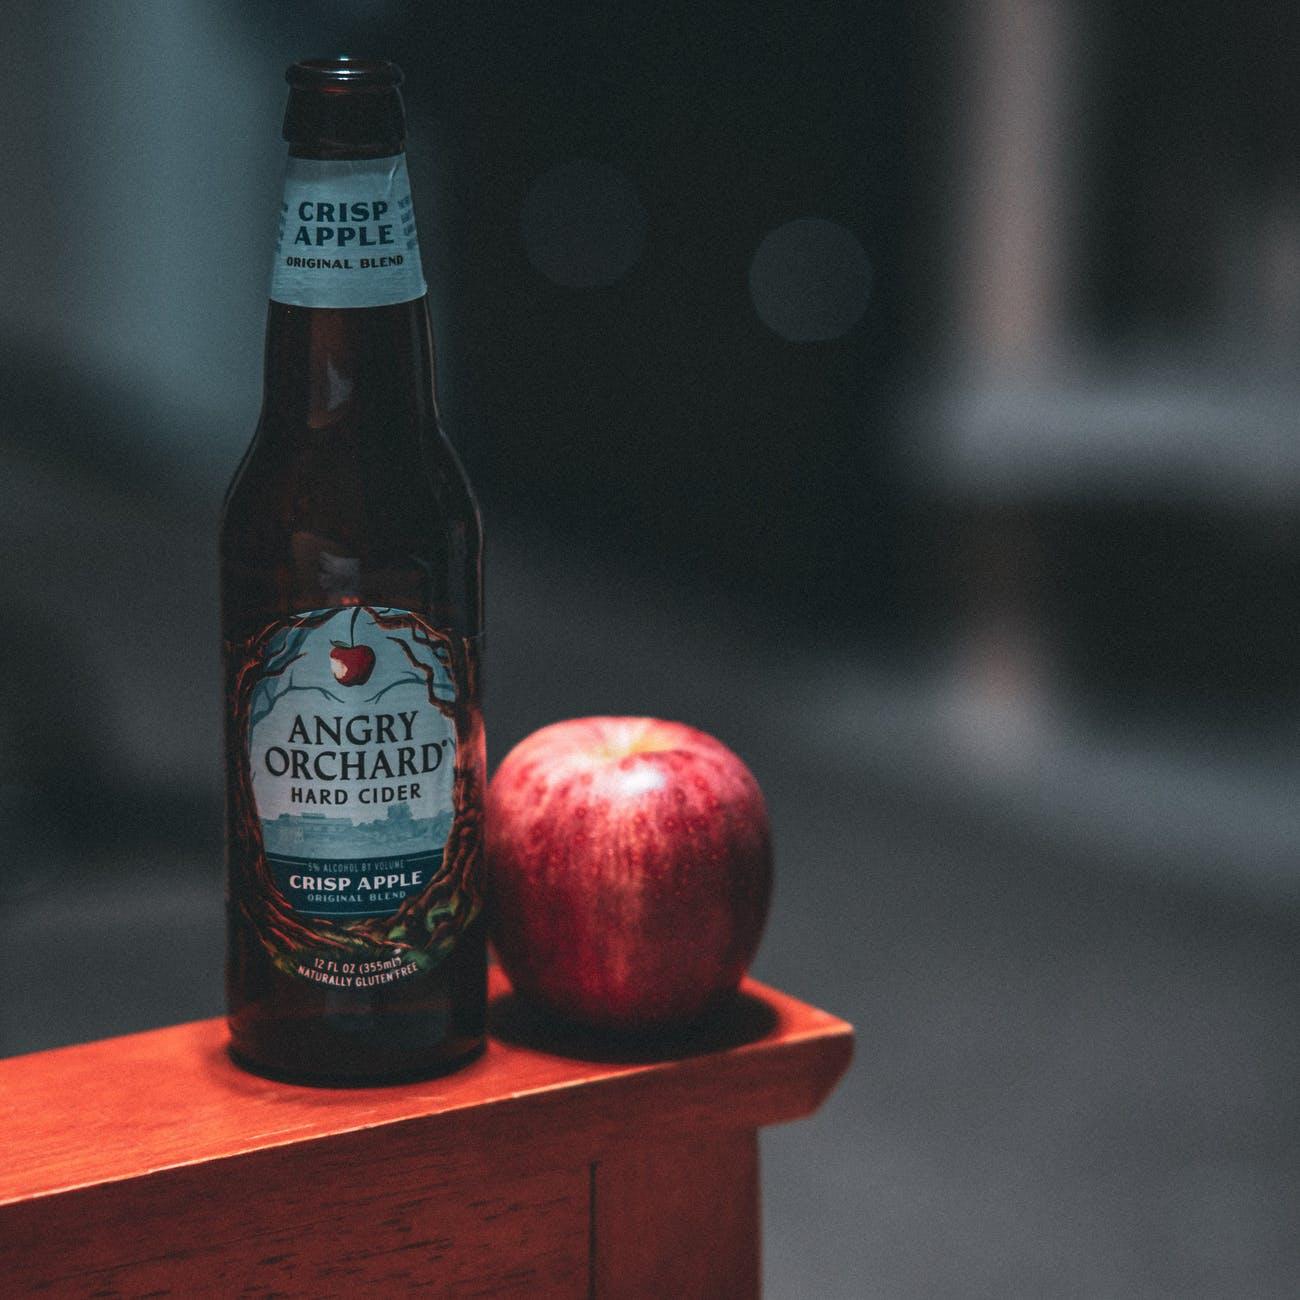 angry orchard hard cider bottle beside red apple fruit